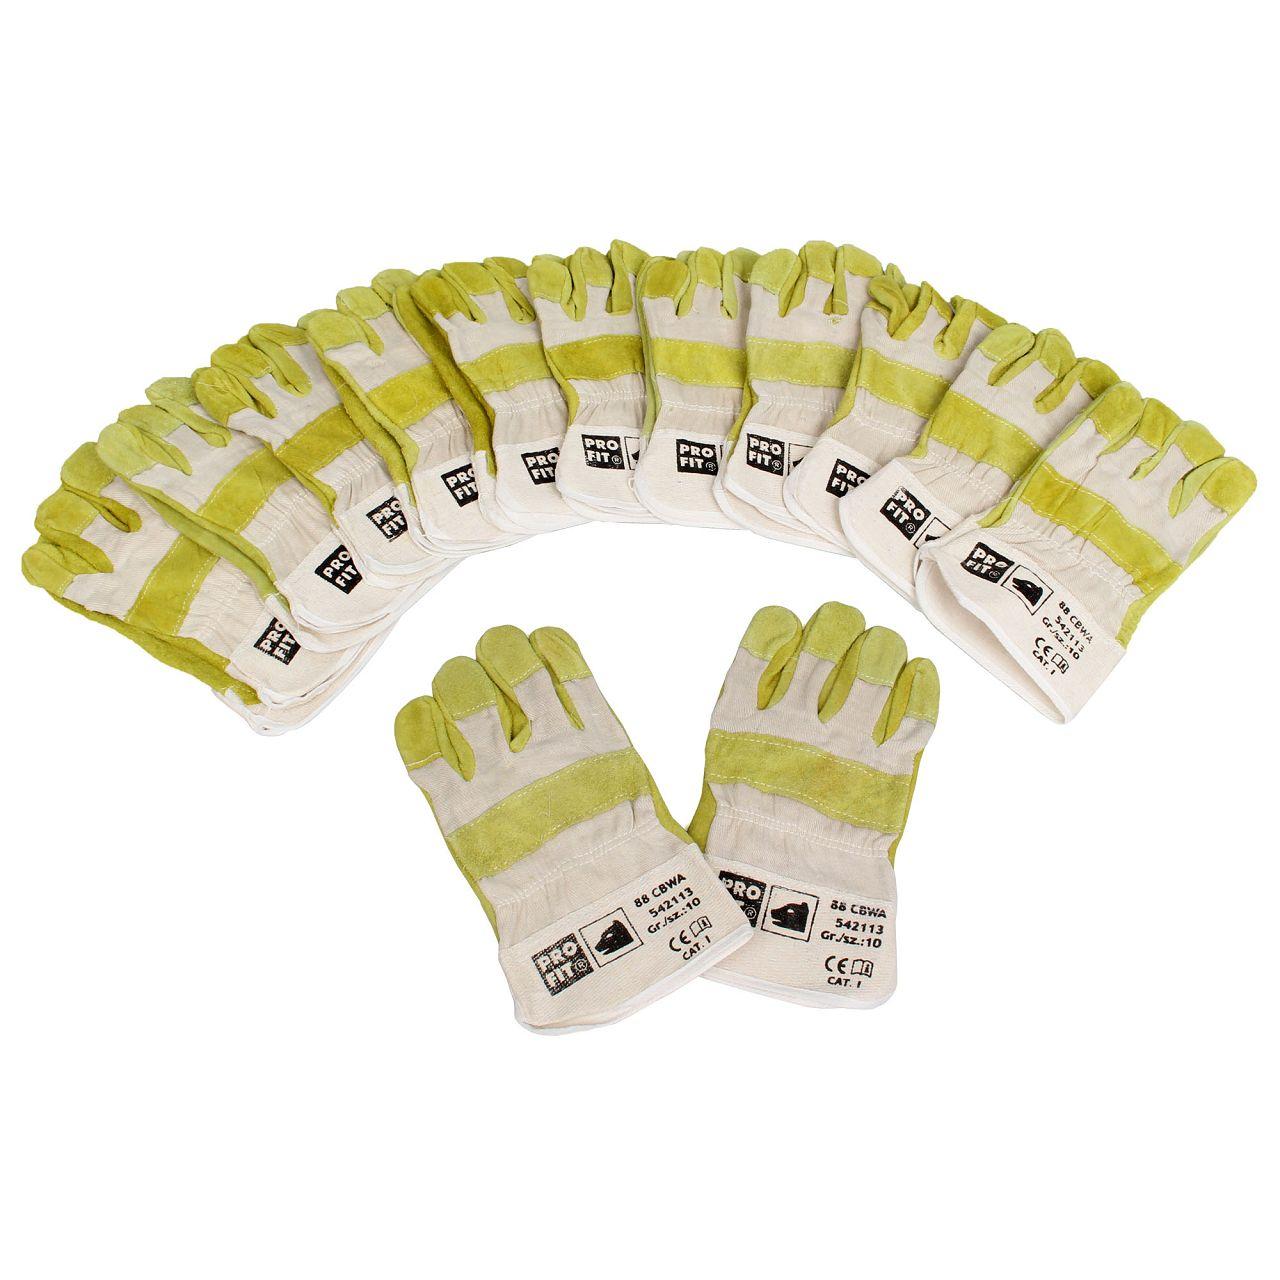 PRO-FIT Rindspaltleder-Handschuhe Arbeitshandschuhe Größe 10 / XL (12 Paar)